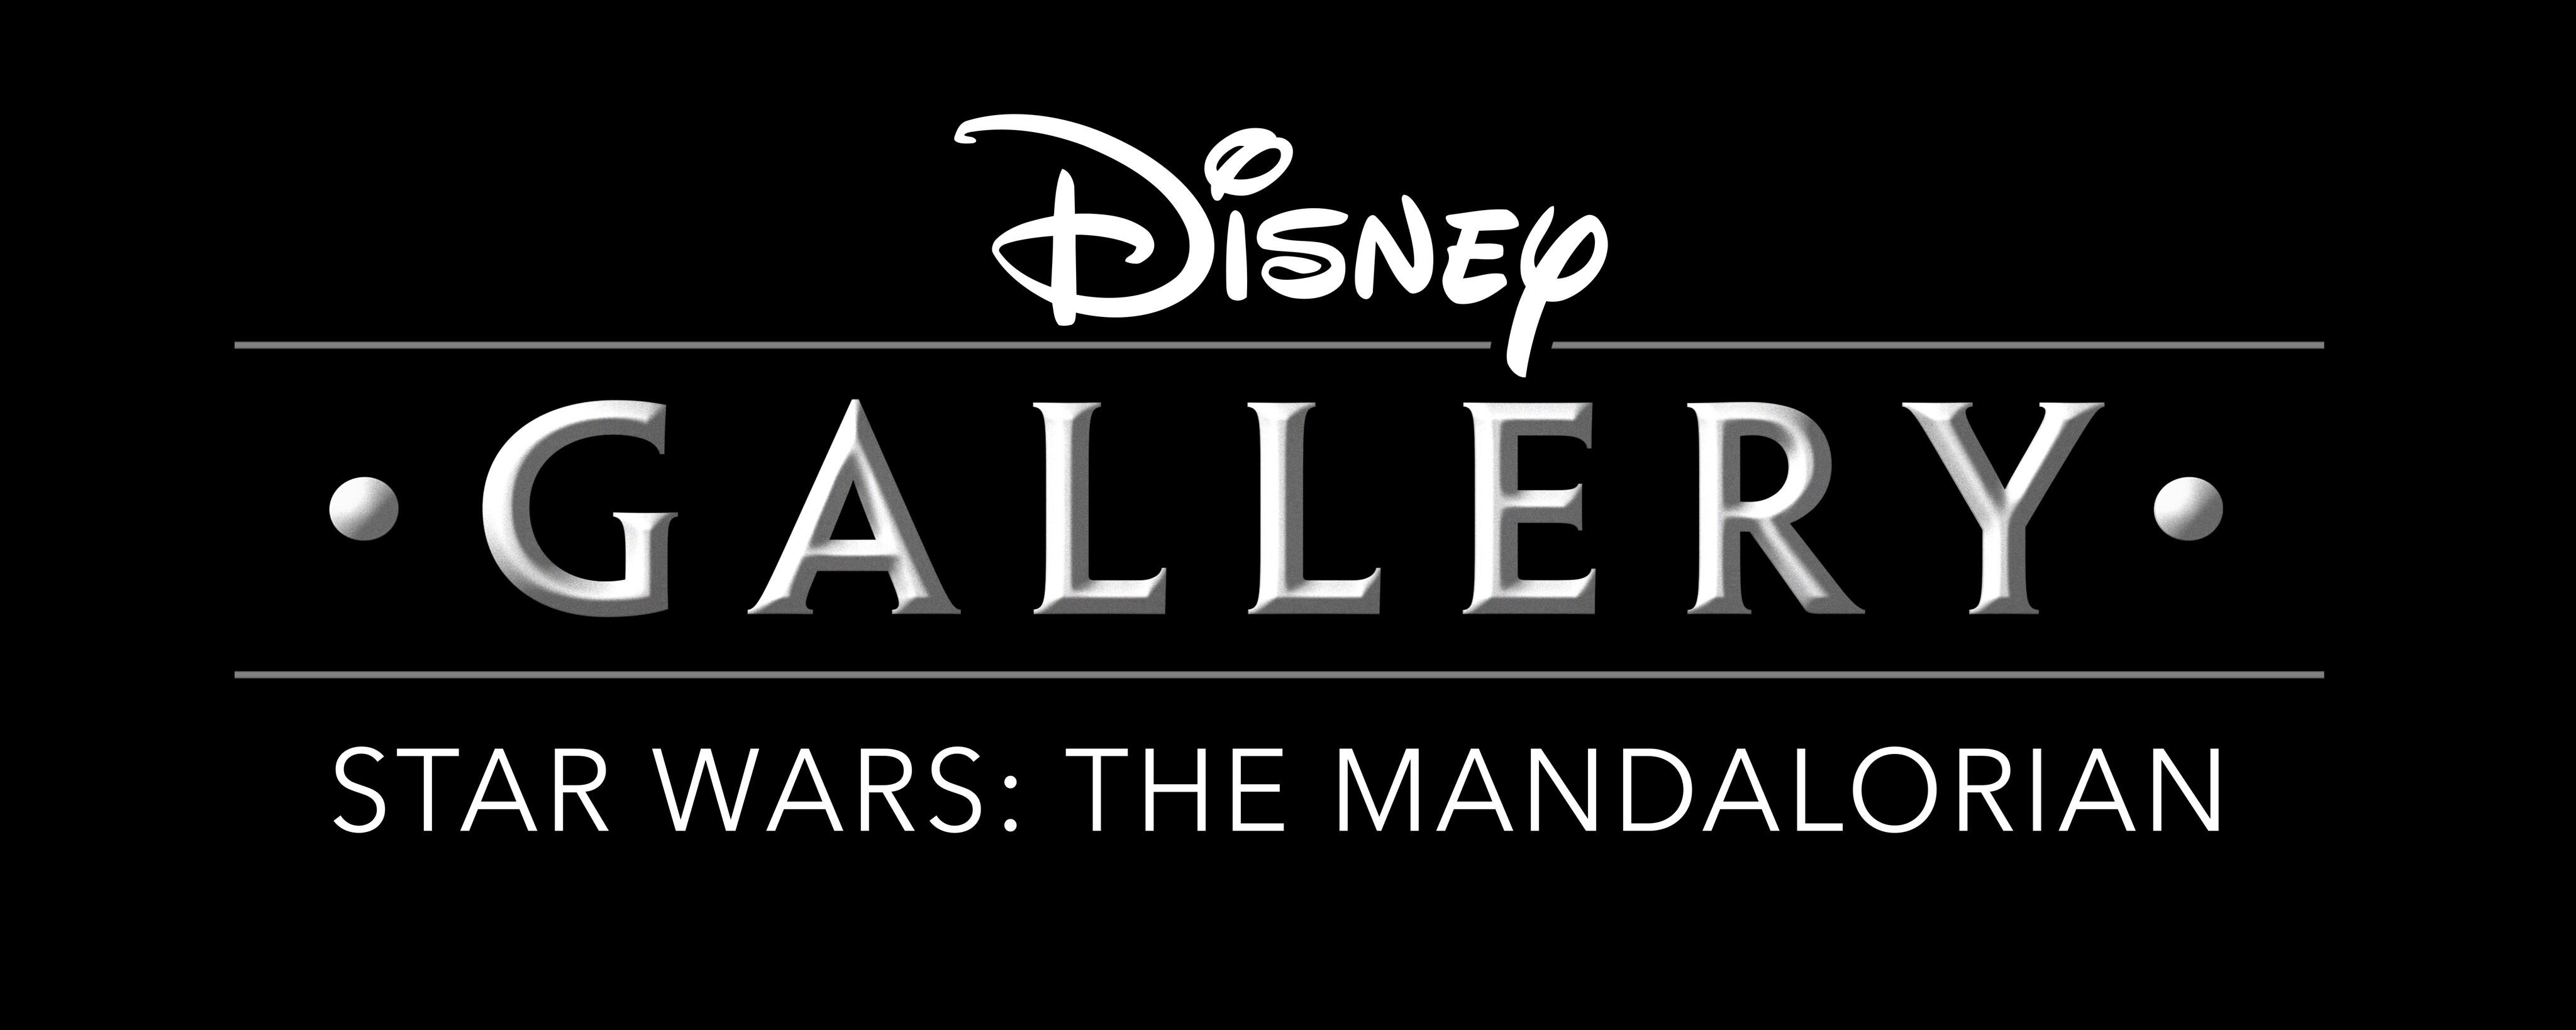 """Disney Gallery: Star Wars: The Mandalorian"""